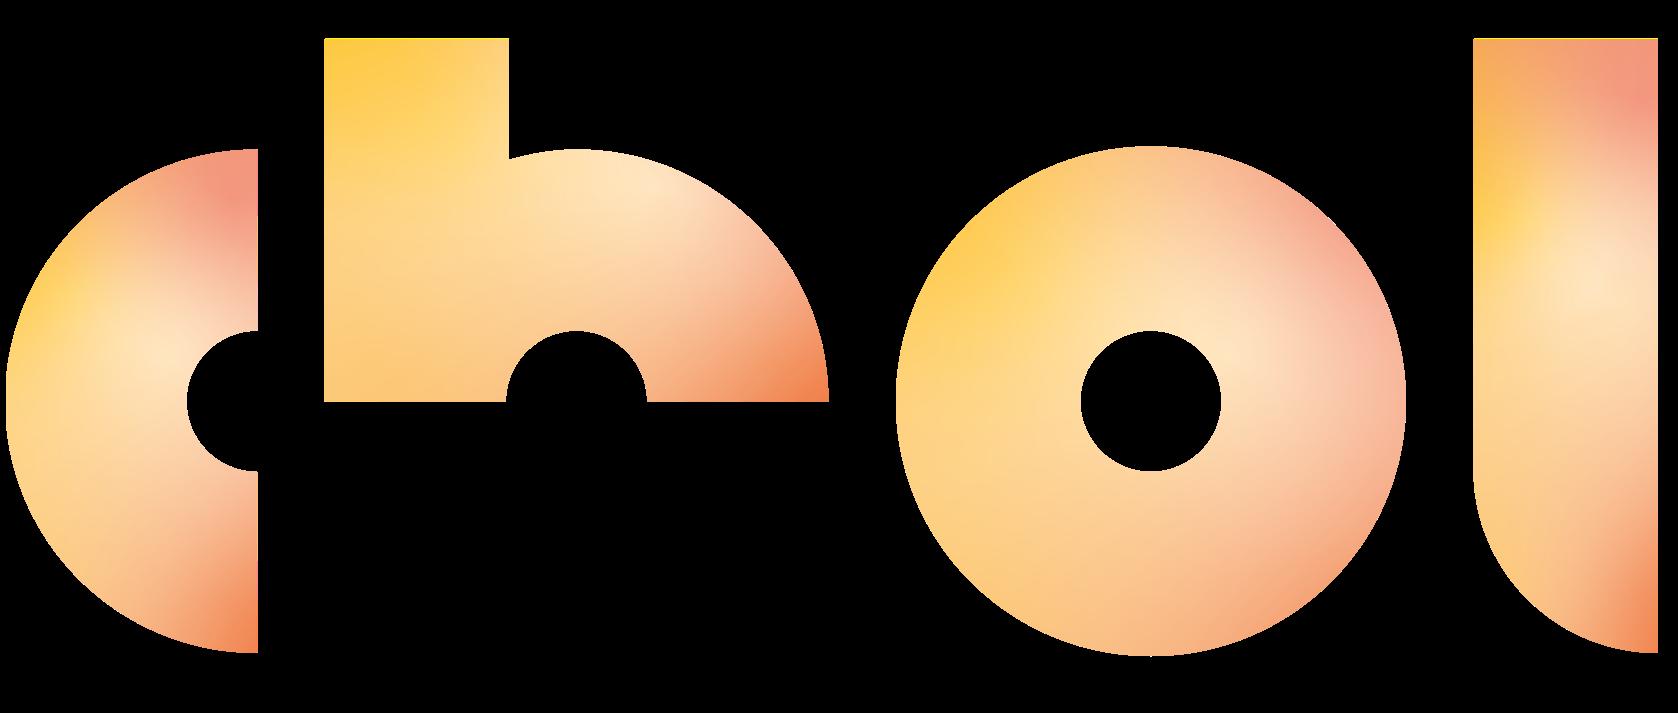 Logo for Chol theatre